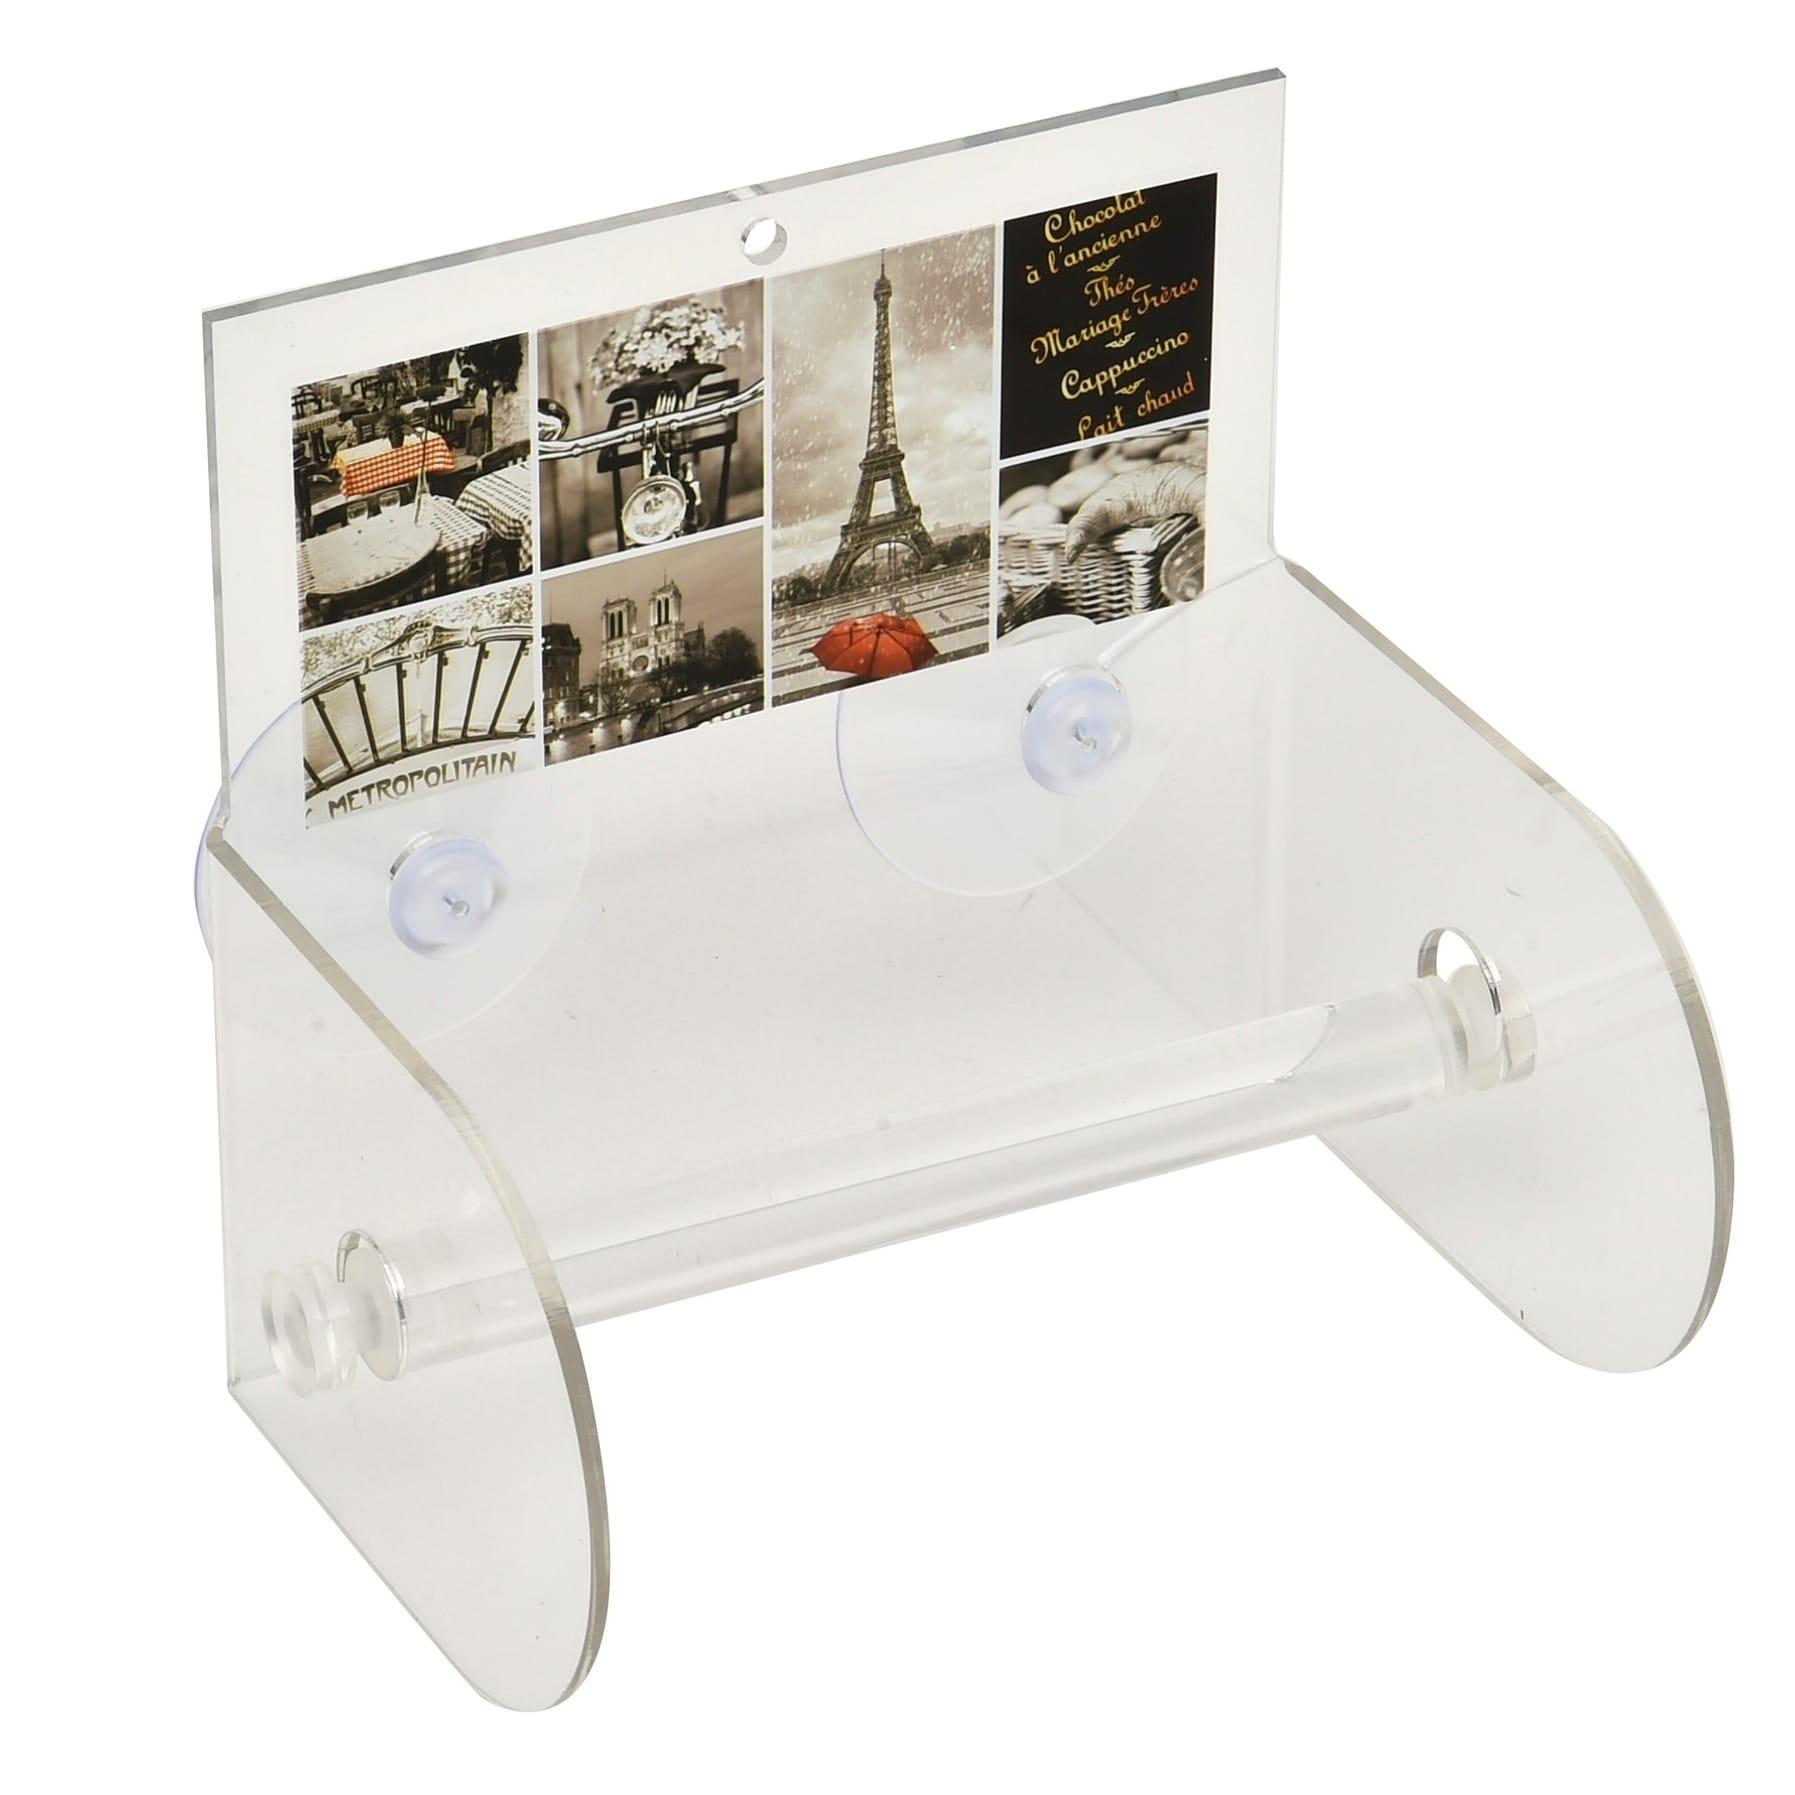 Evideco Cafe Paris Toilet Tissue Paper One Roll Holder Su...